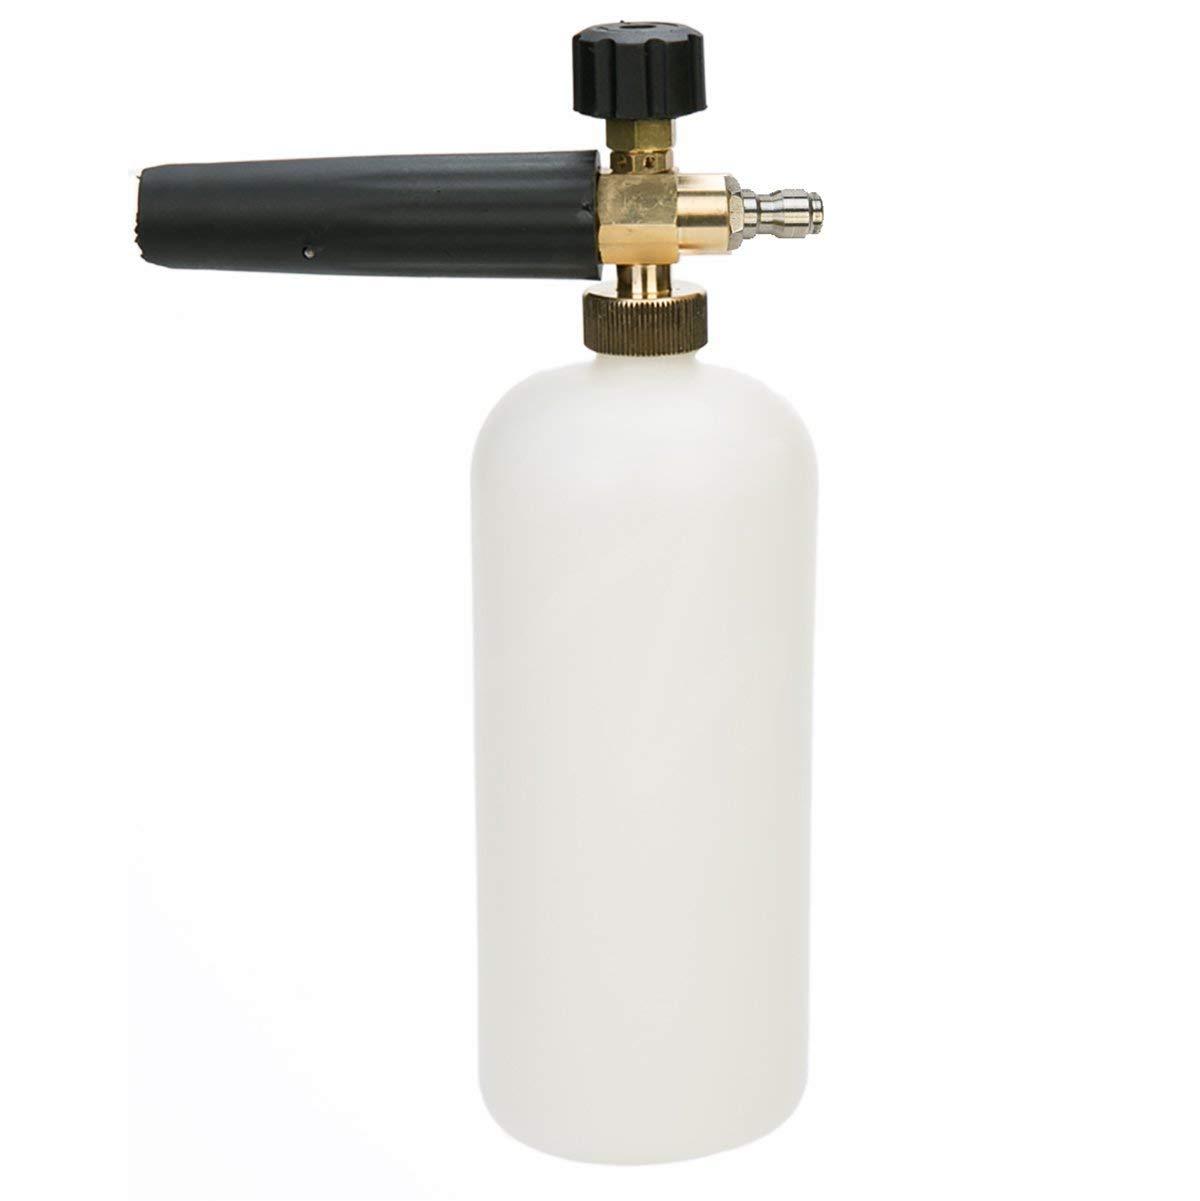 "8MILELAKE Foam Cannon 1/4"" Quick Release Adjustable Pressure Washer Jet Snow Foam Lance"